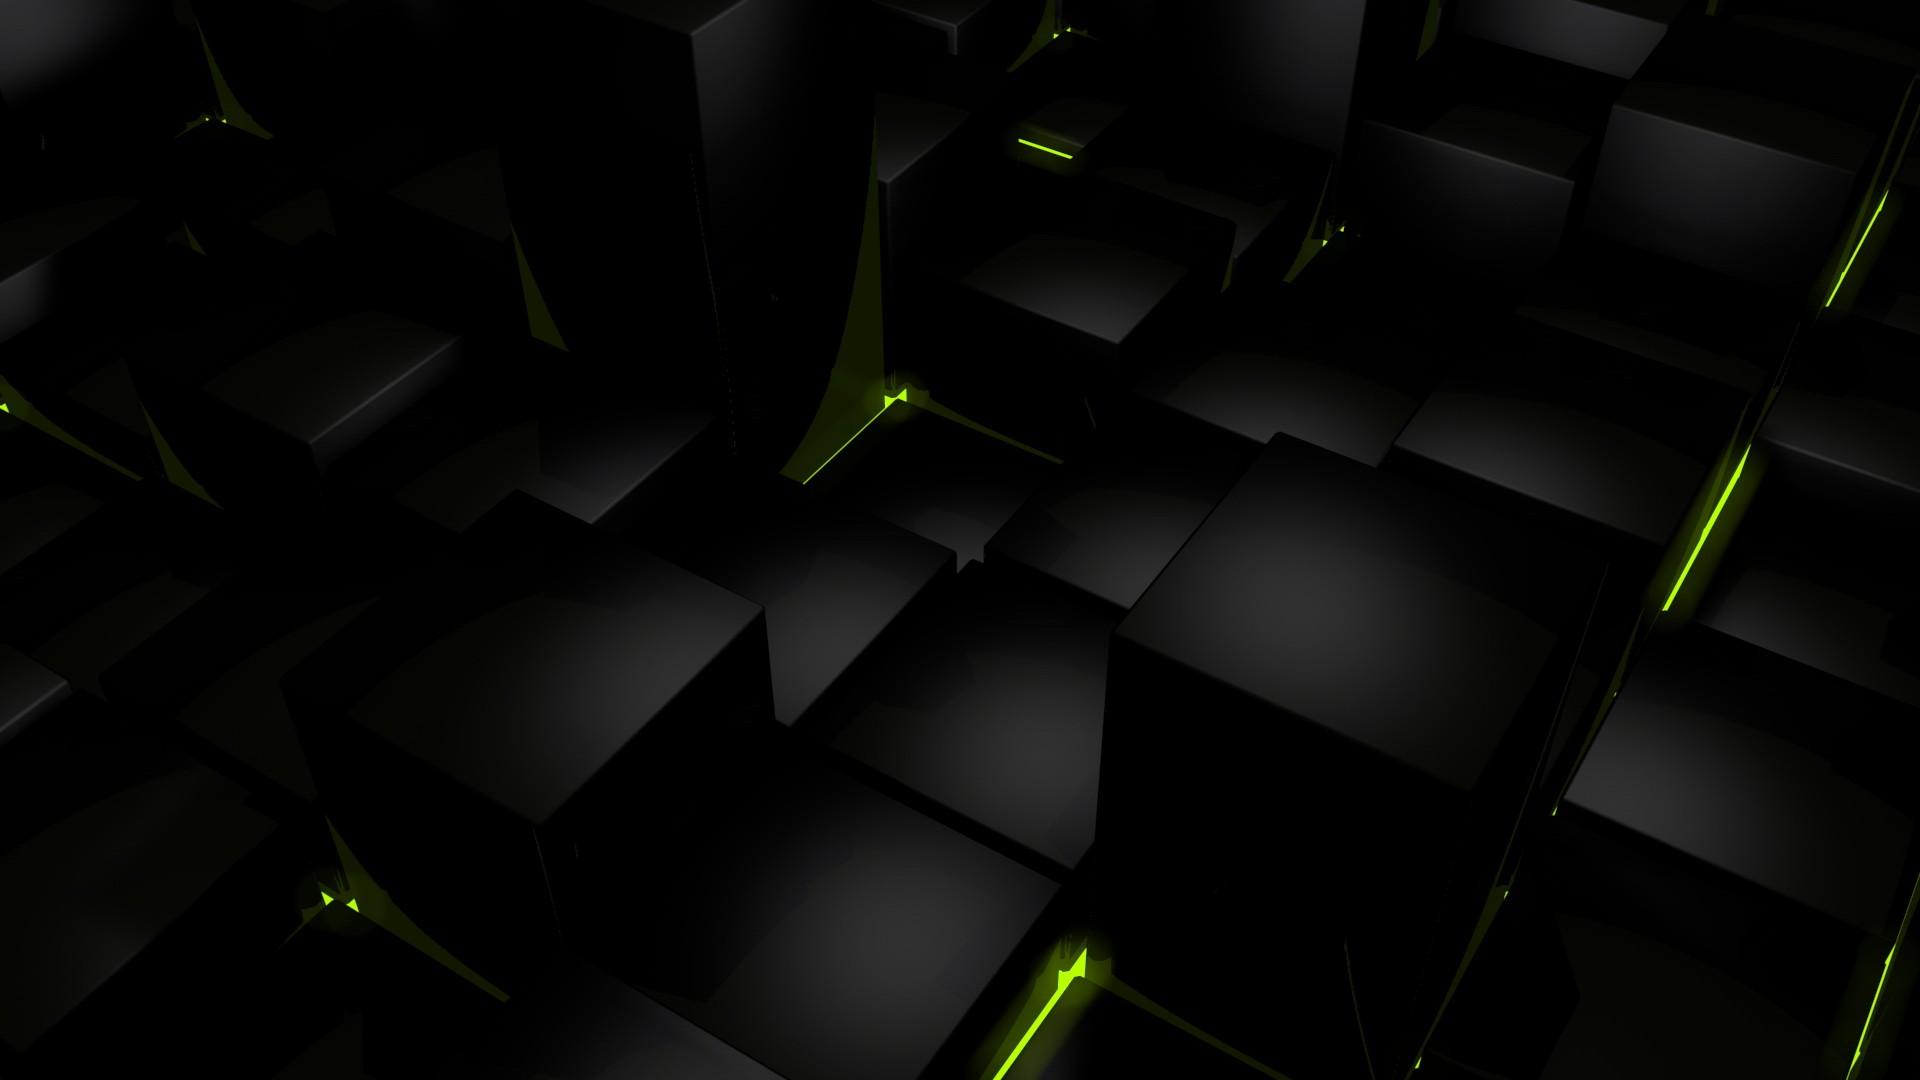 ... glow computer graphics wallpaper   1920x1080   67125   WallpaperUP